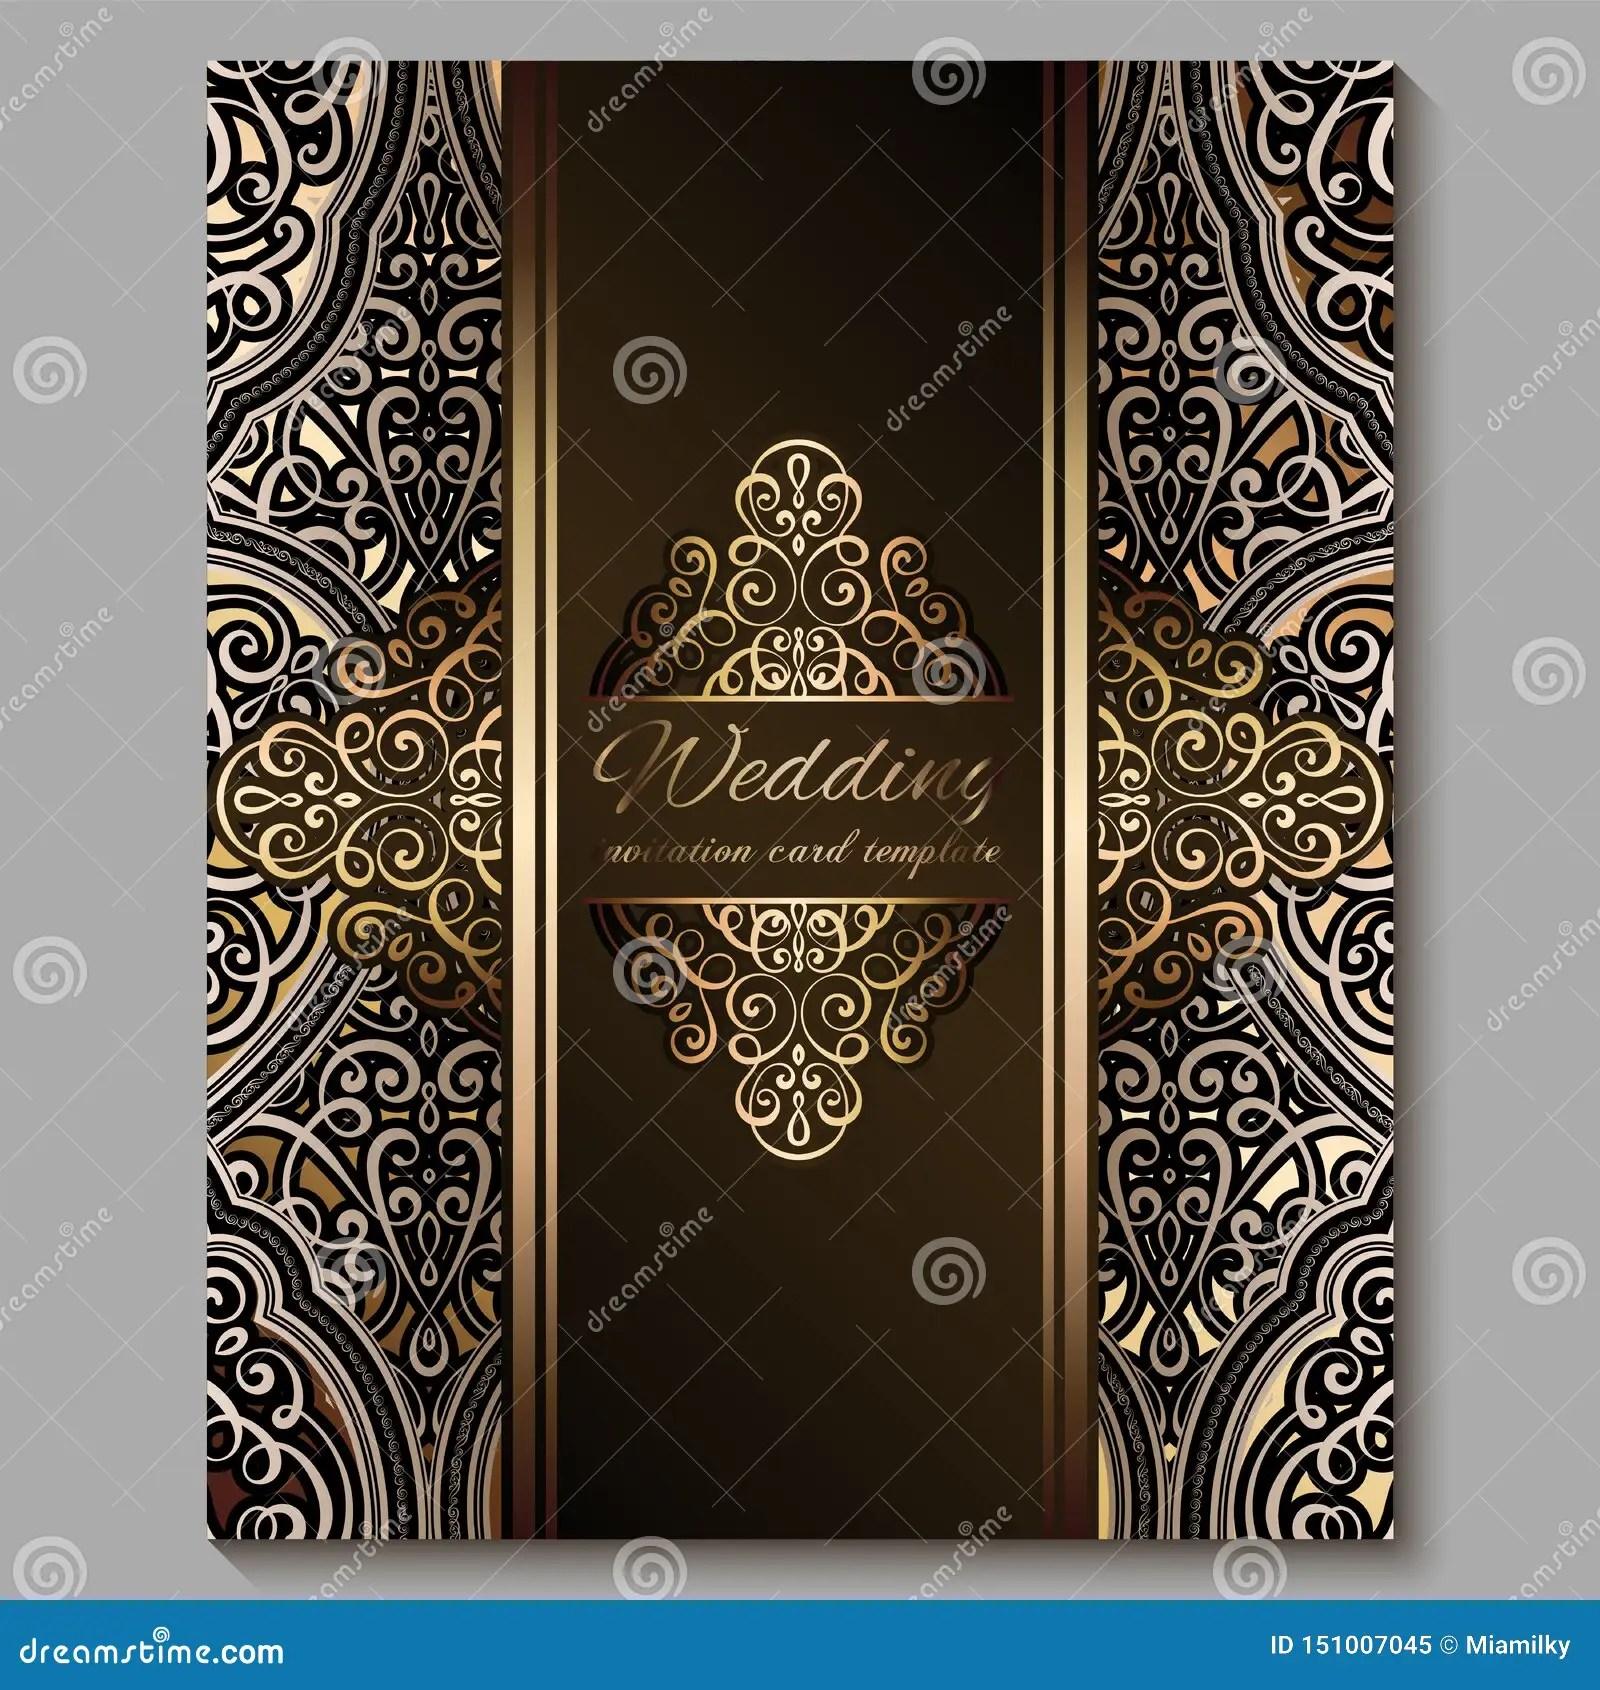 https www dreamstime com wedding invitation card gold shiny eastern baroque rich foliage royal bronze ornate islamic background your design image151007045